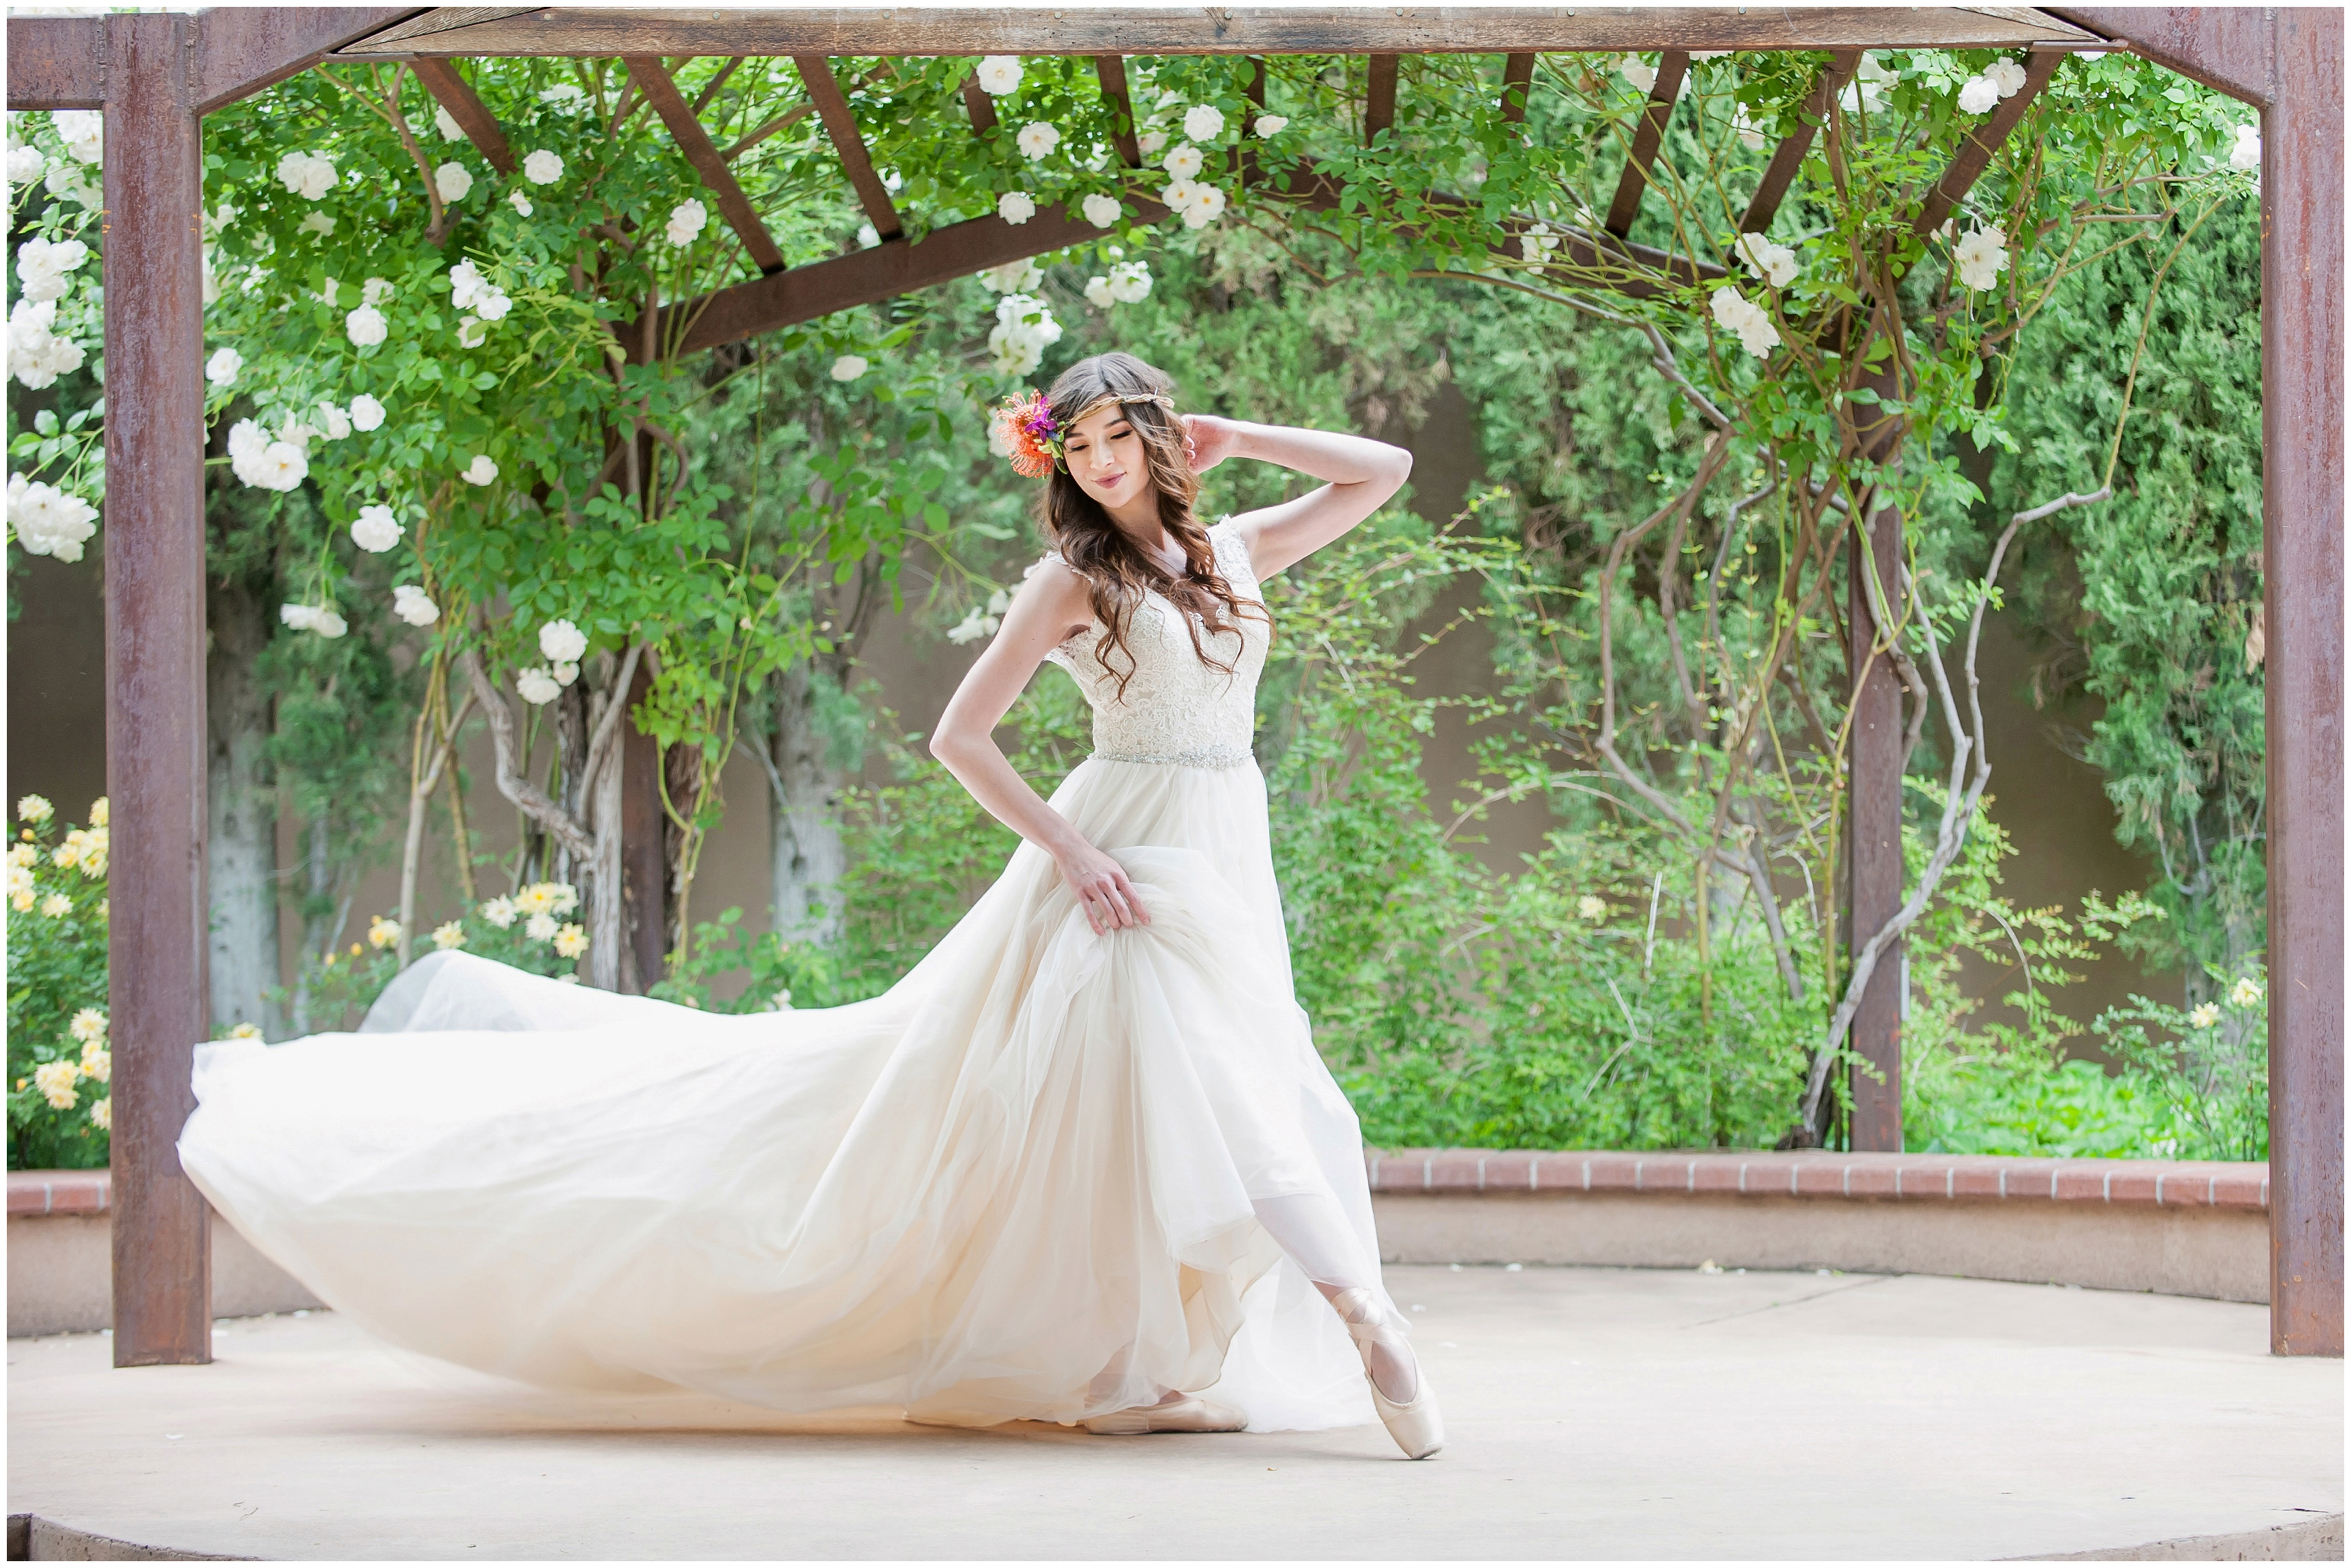 ballerina_brides_botanical_gardens_0014.jpg